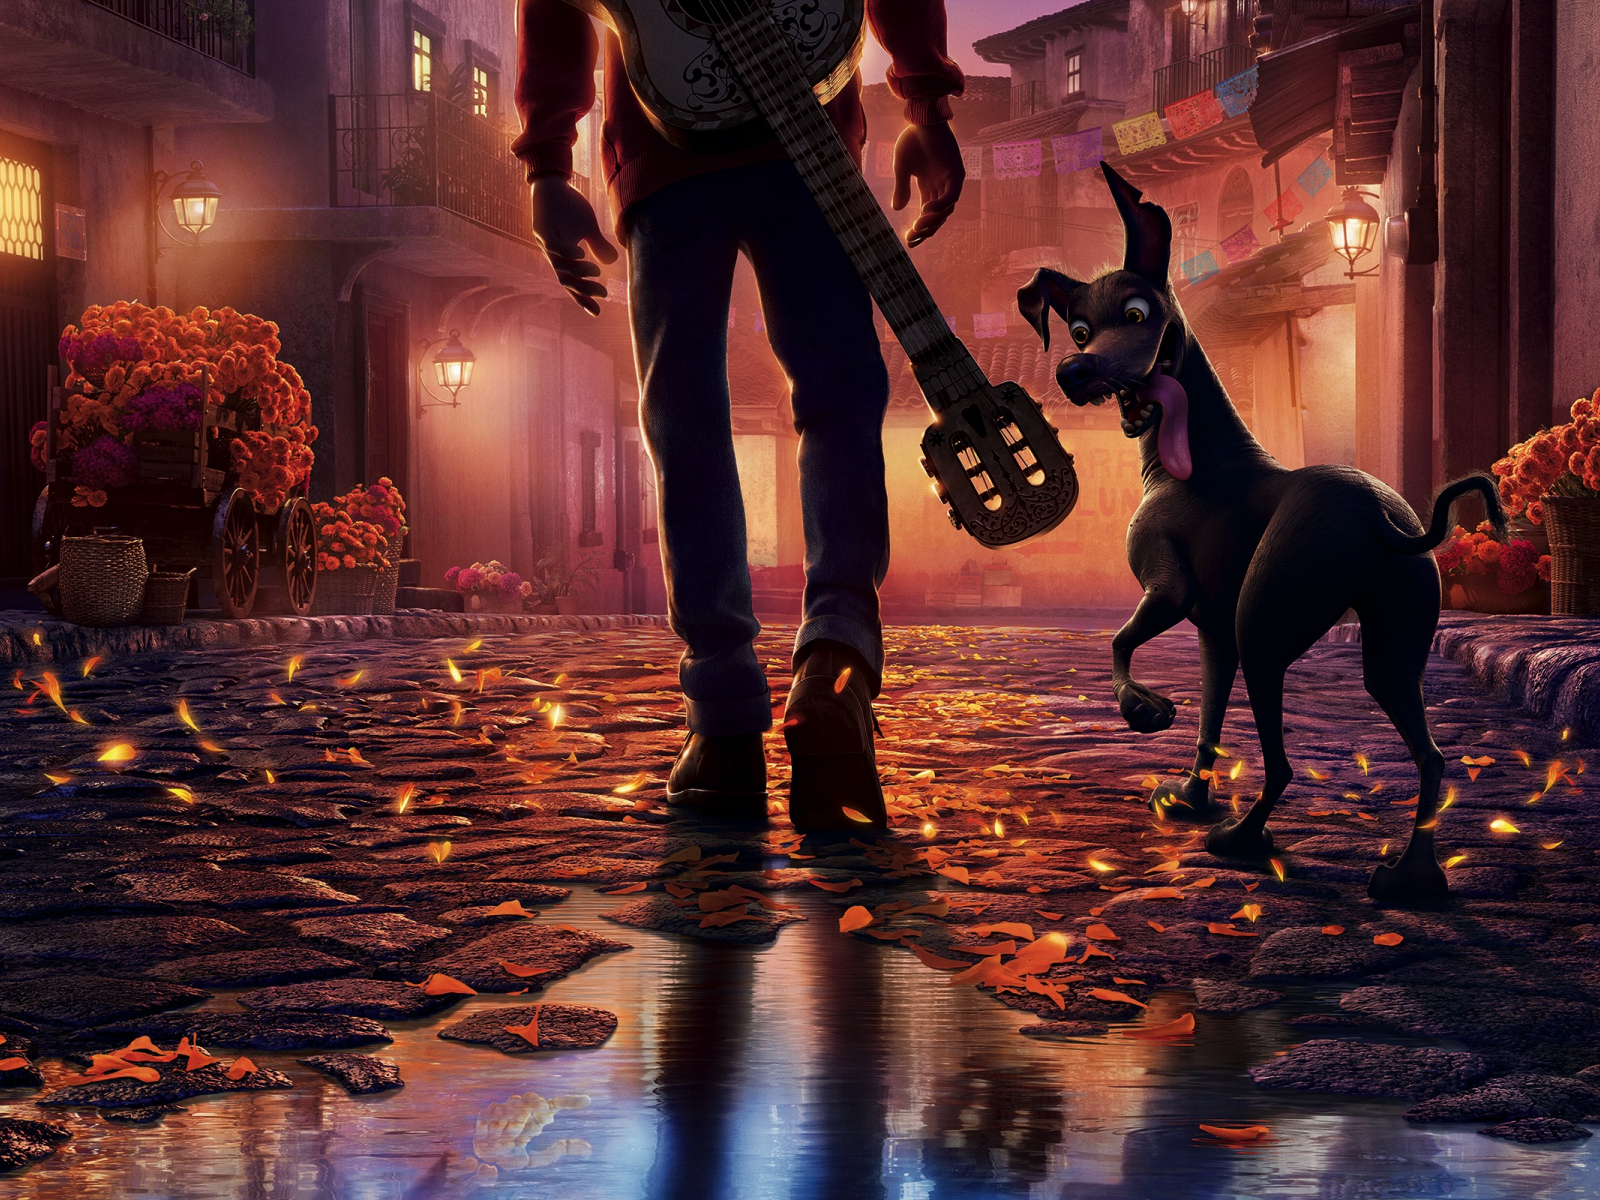 Desktop Wallpaper Coco, Animated Movie, Pixar, Dog, Street ...